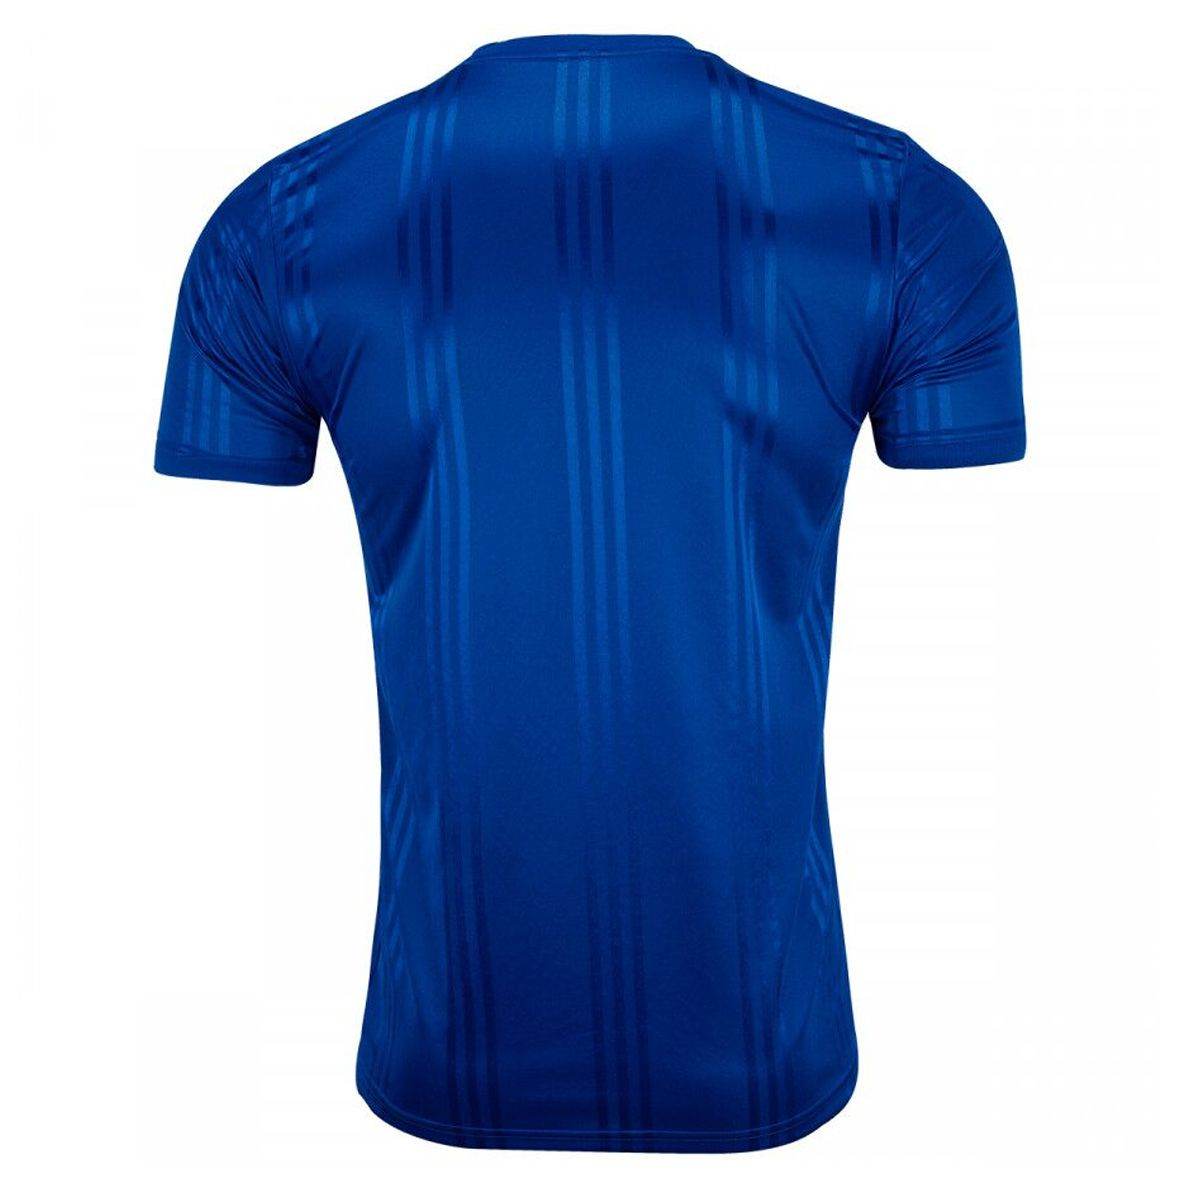 Camisa Cruzeiro I 20/21 s/nº Torcedor Adidas Masculina